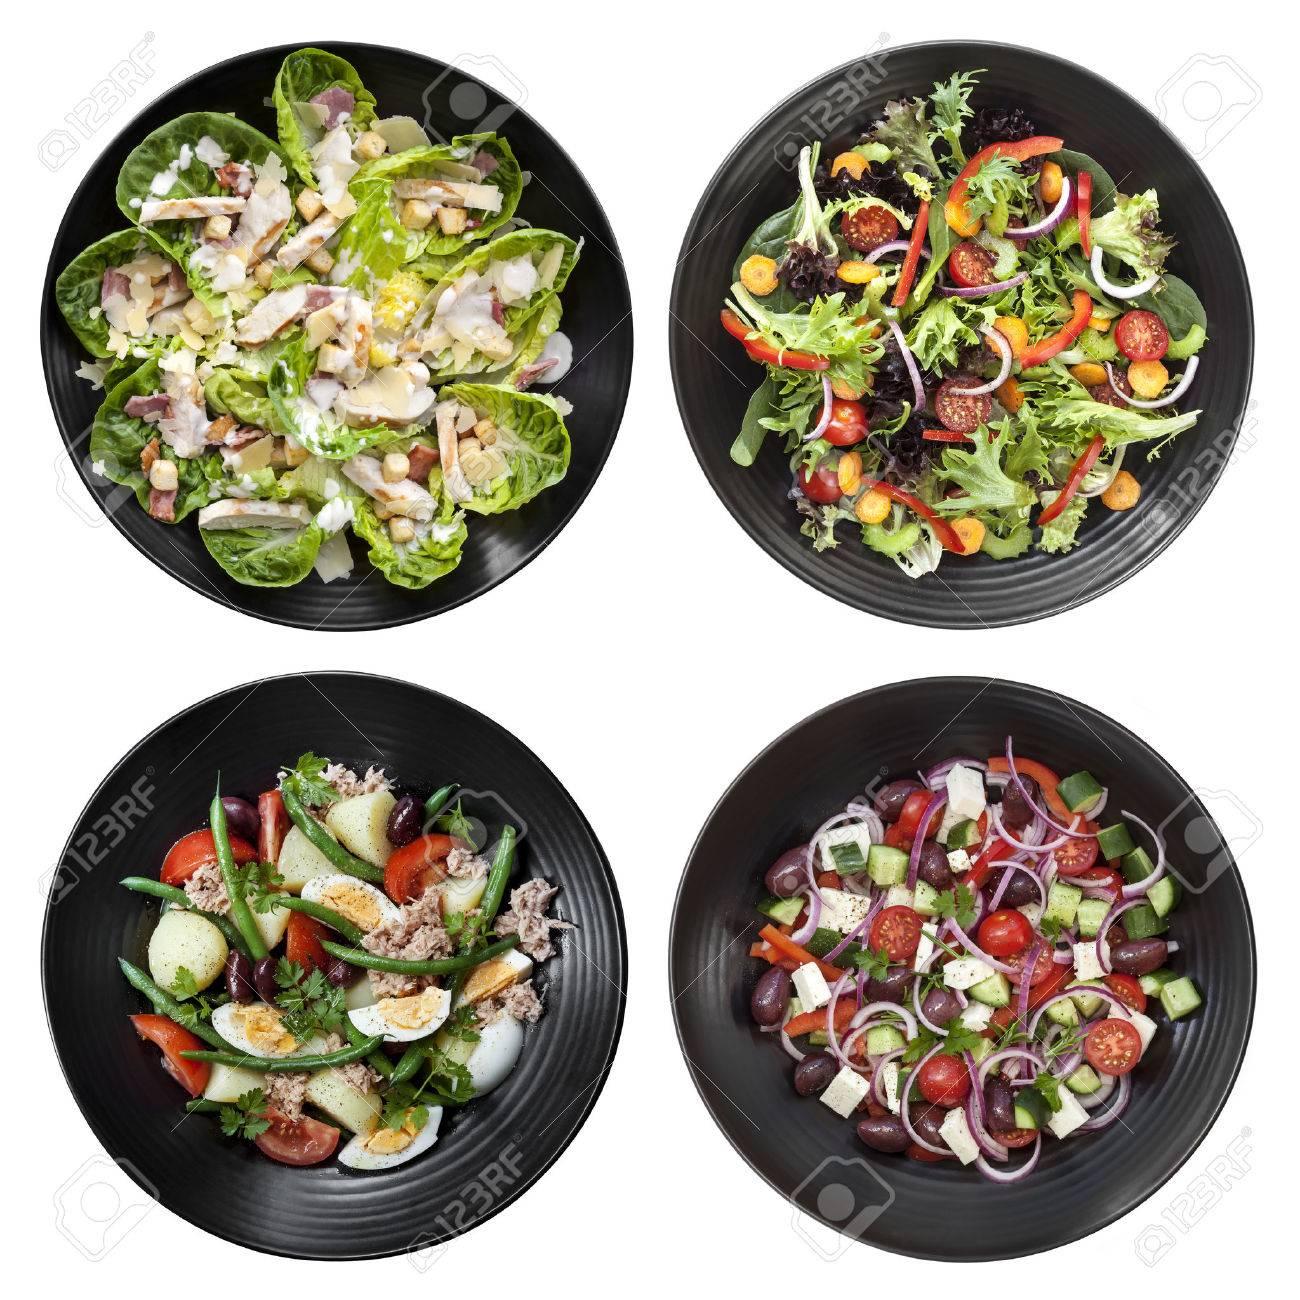 Set of different salads on white background. Includes chicken caesar, garden, nicoise, and Greek. - 32575777